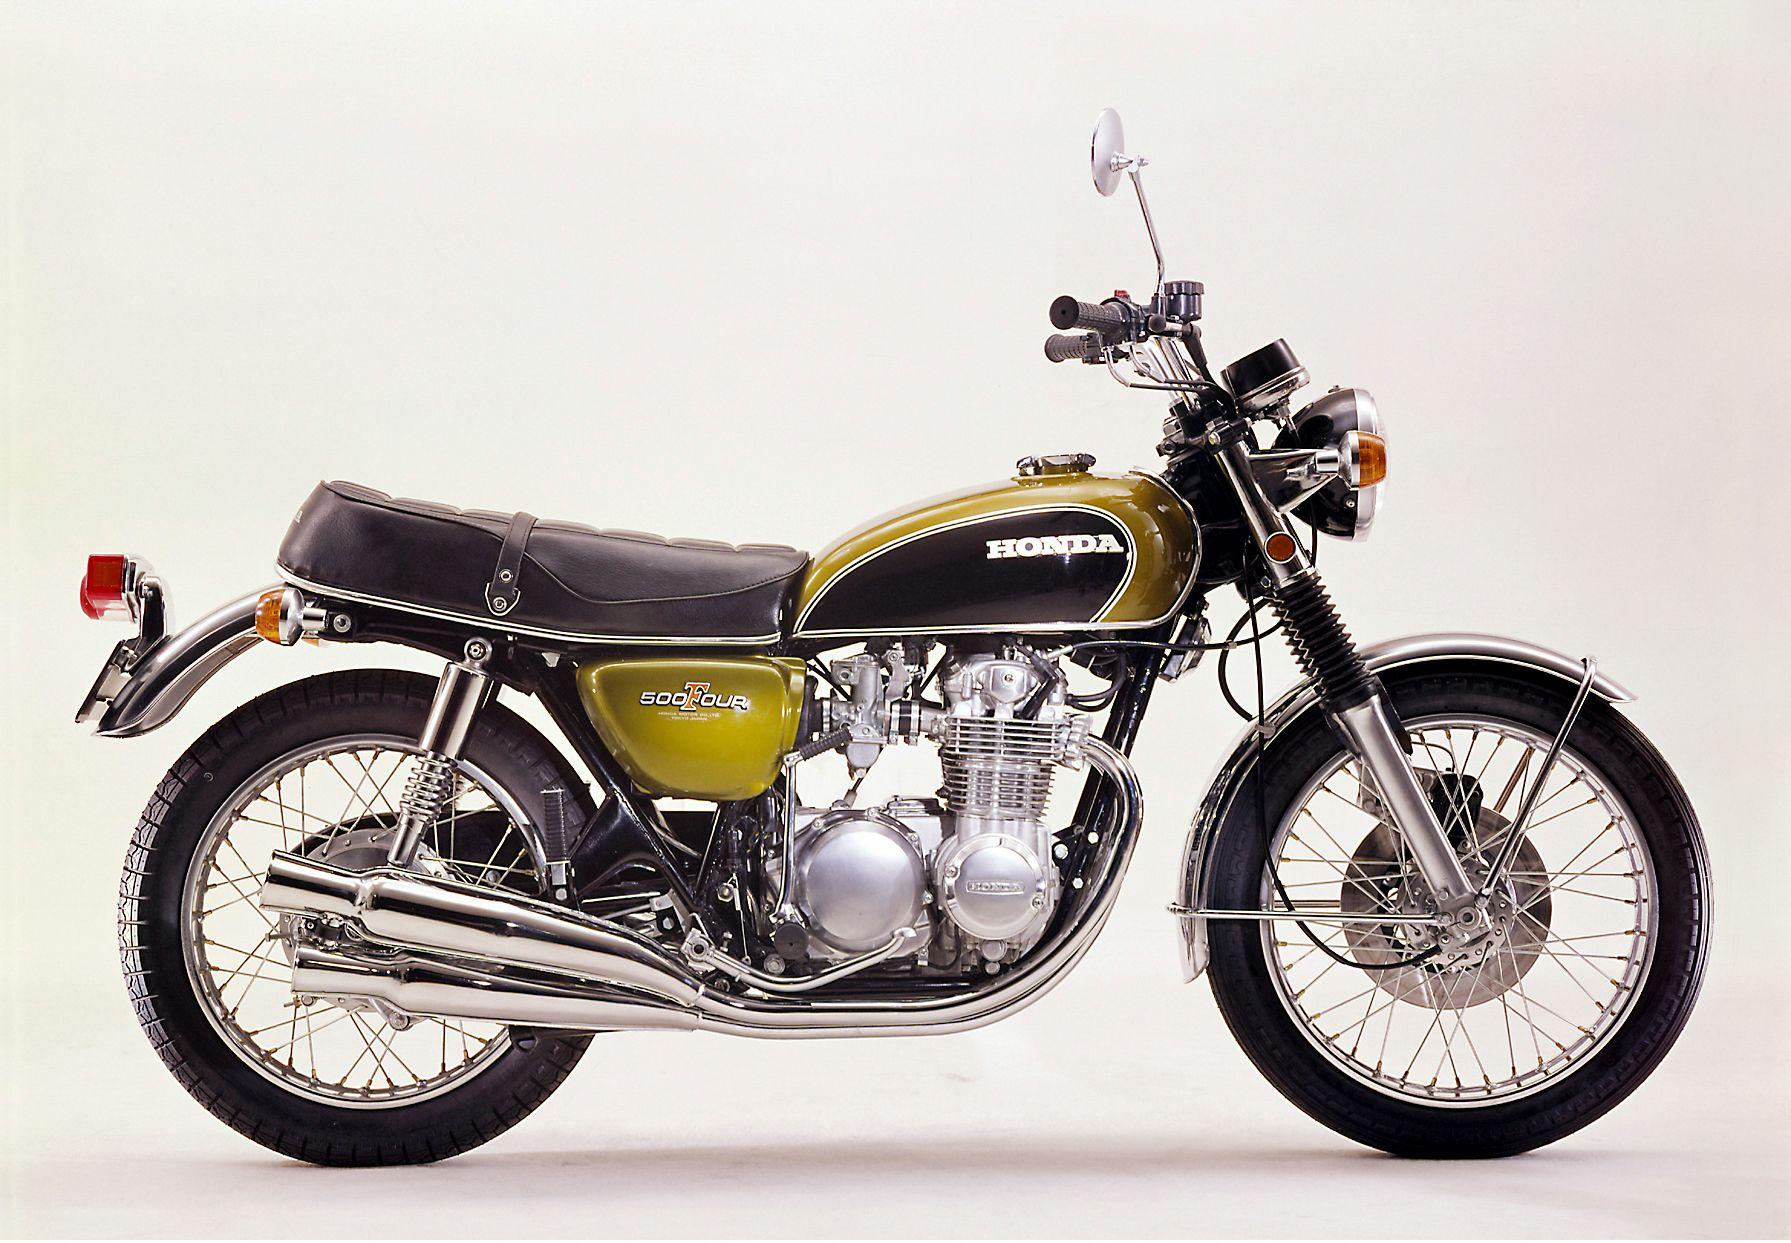 Honda Cb 500 Four 550 Pinterest 1970 Motorcycle Vin Decoder